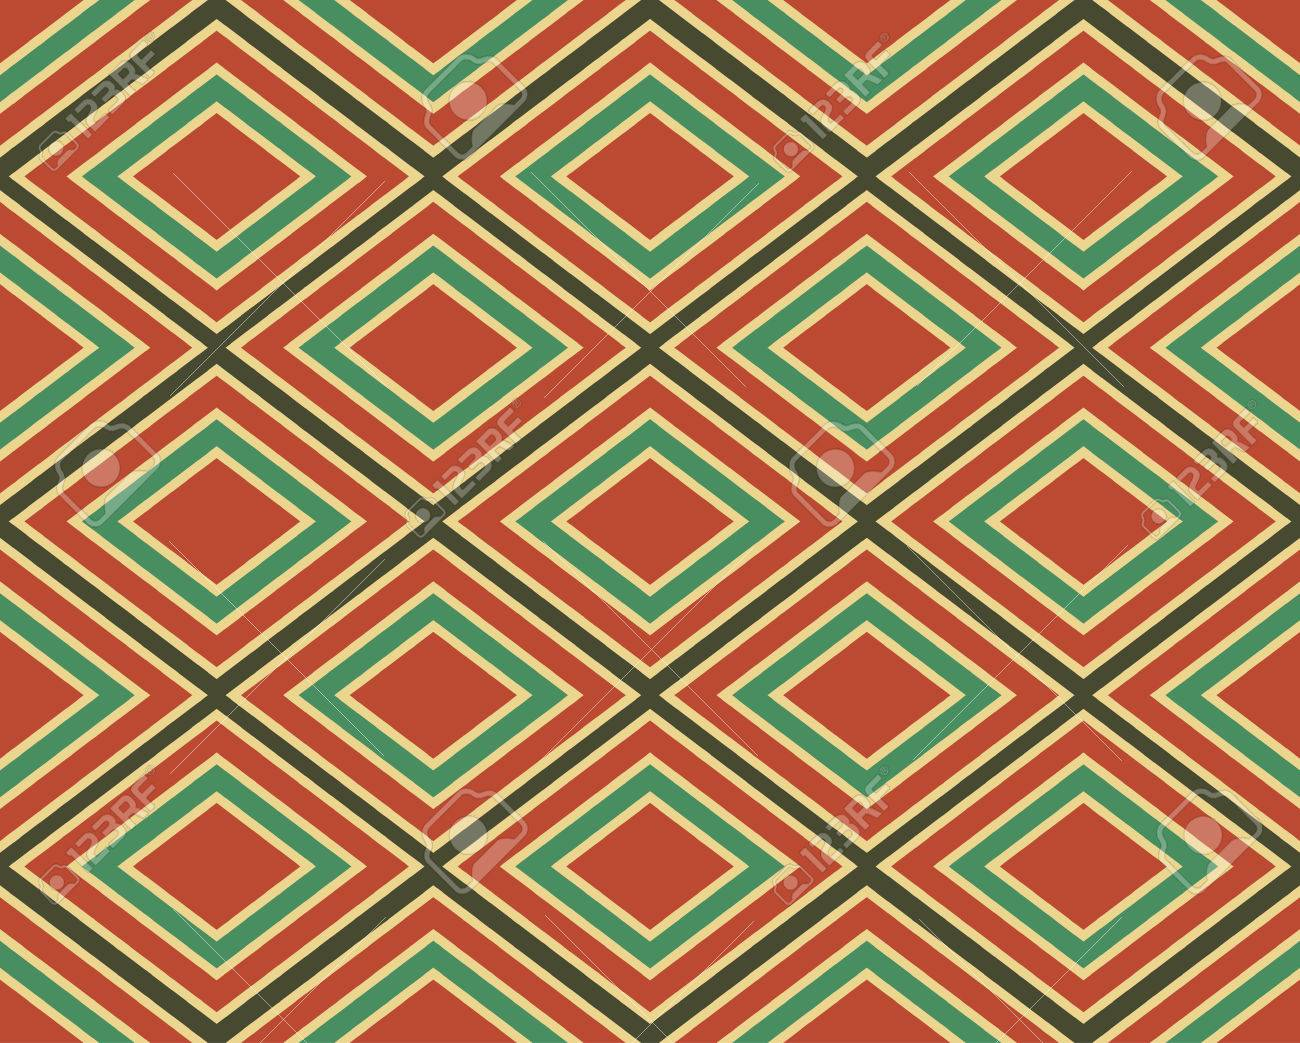 Jahrgang Geometrischen Muster Aus Rauten Vector Nahtlose Ornament